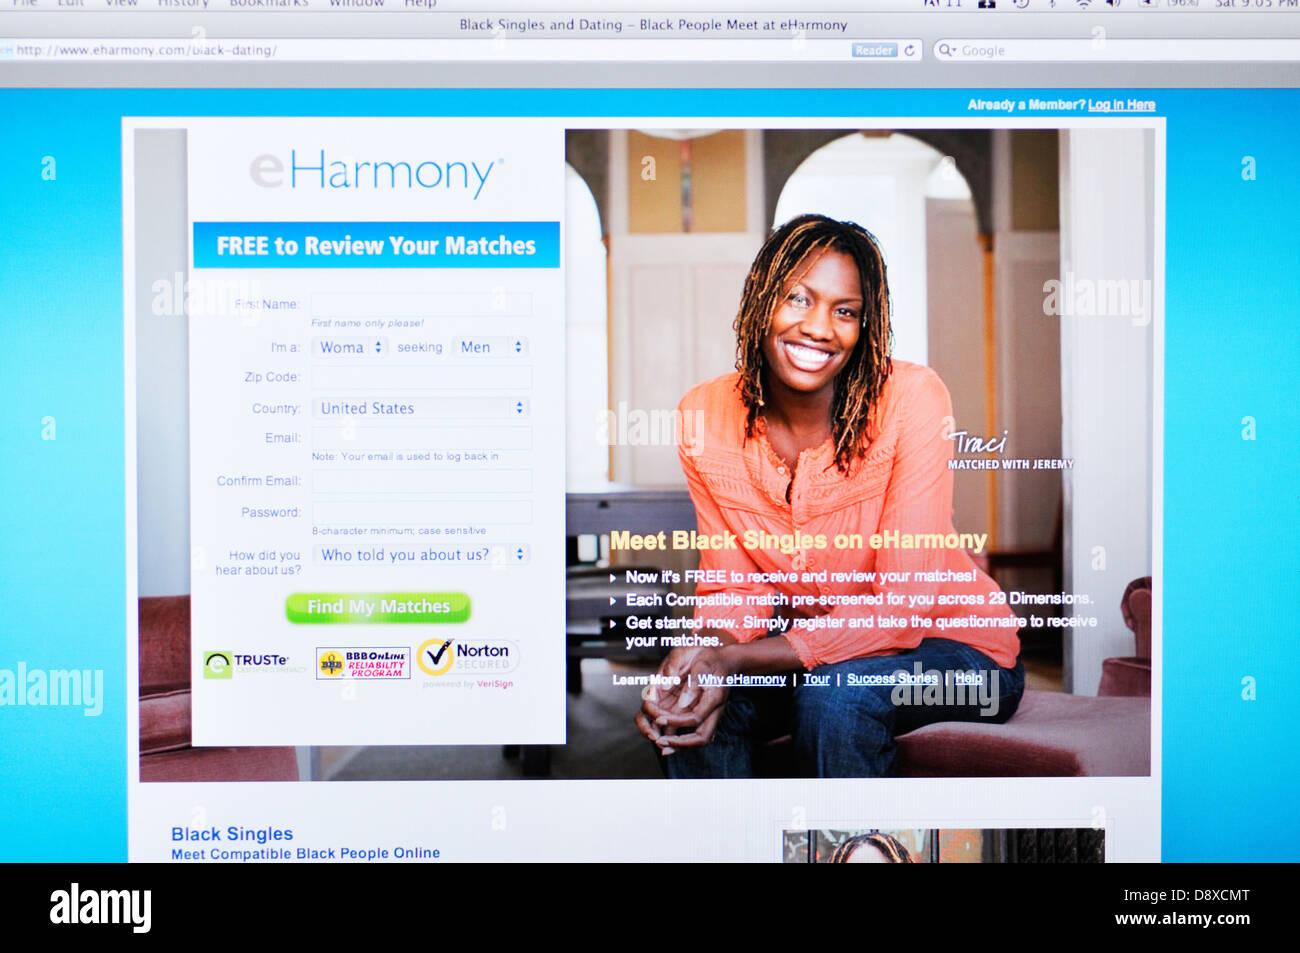 Is eharmony a good dating website